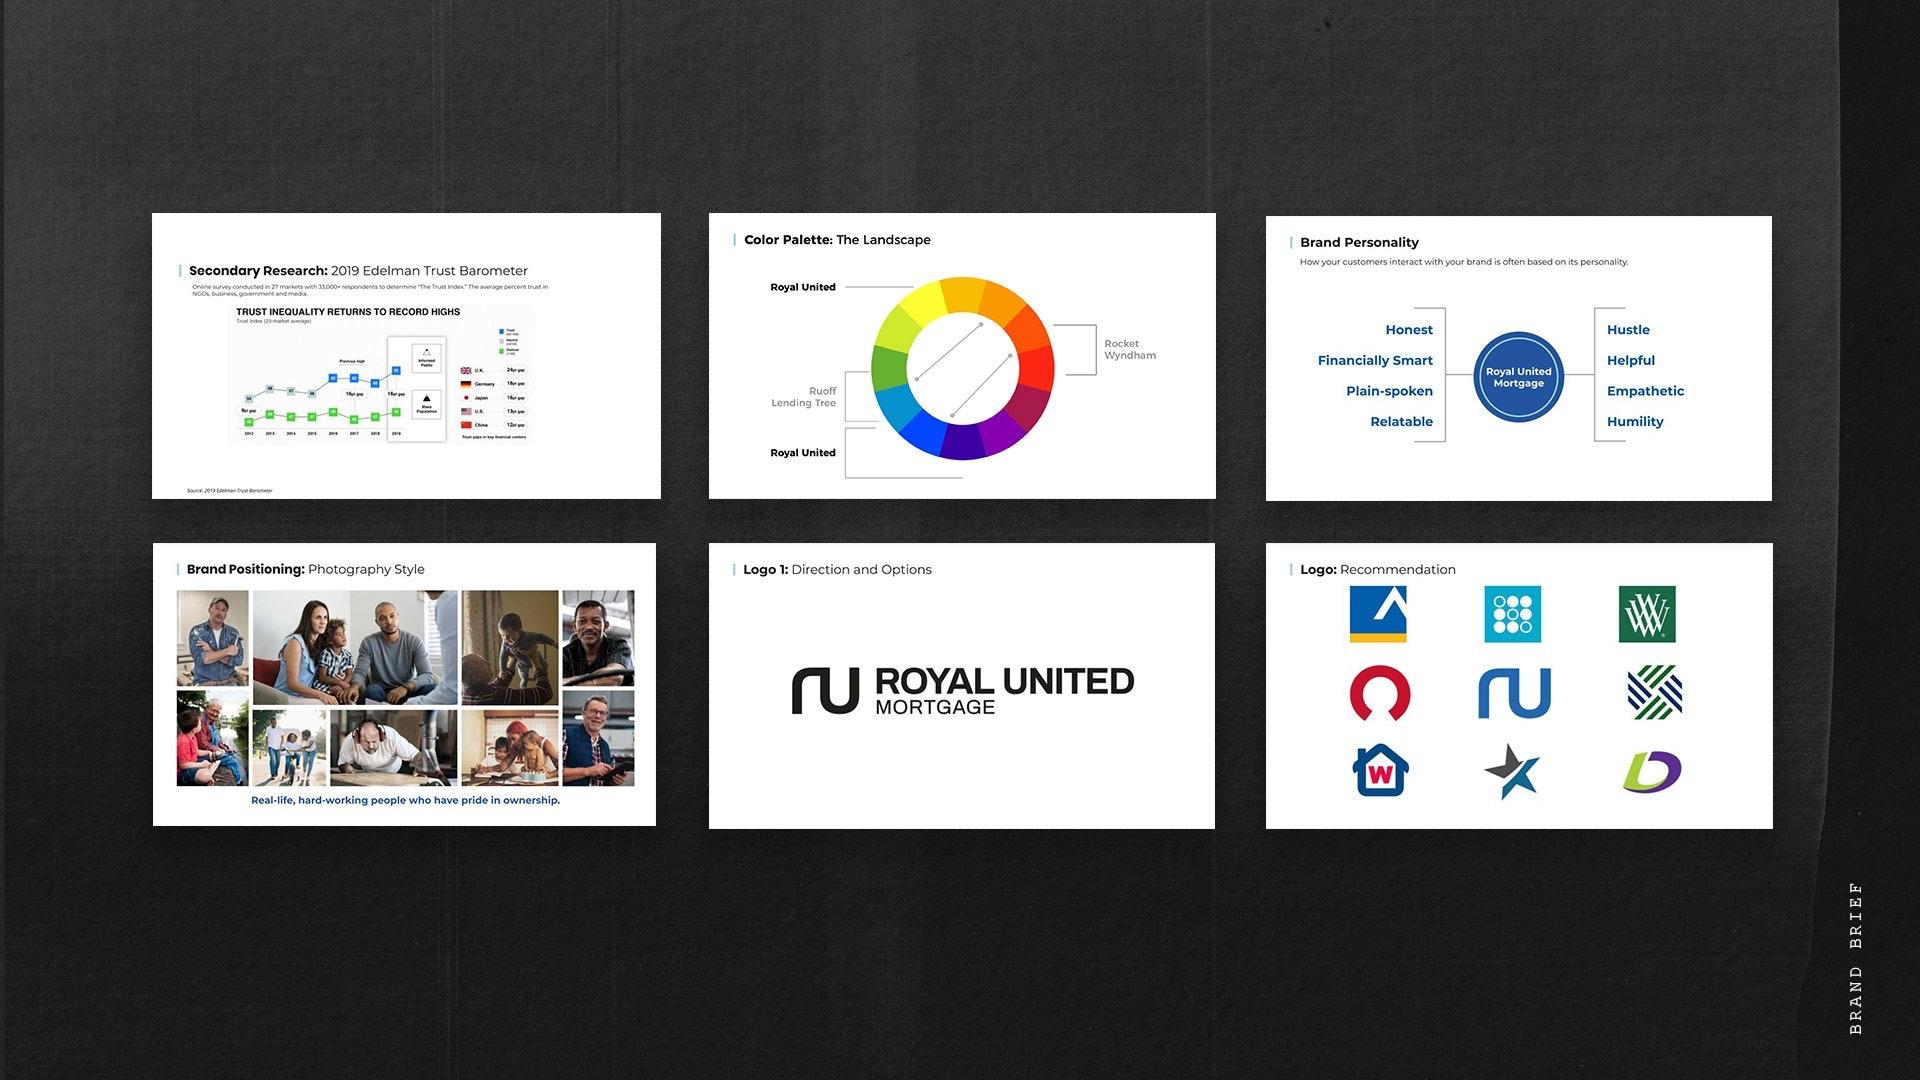 Royal United Mortgage Brand Brief